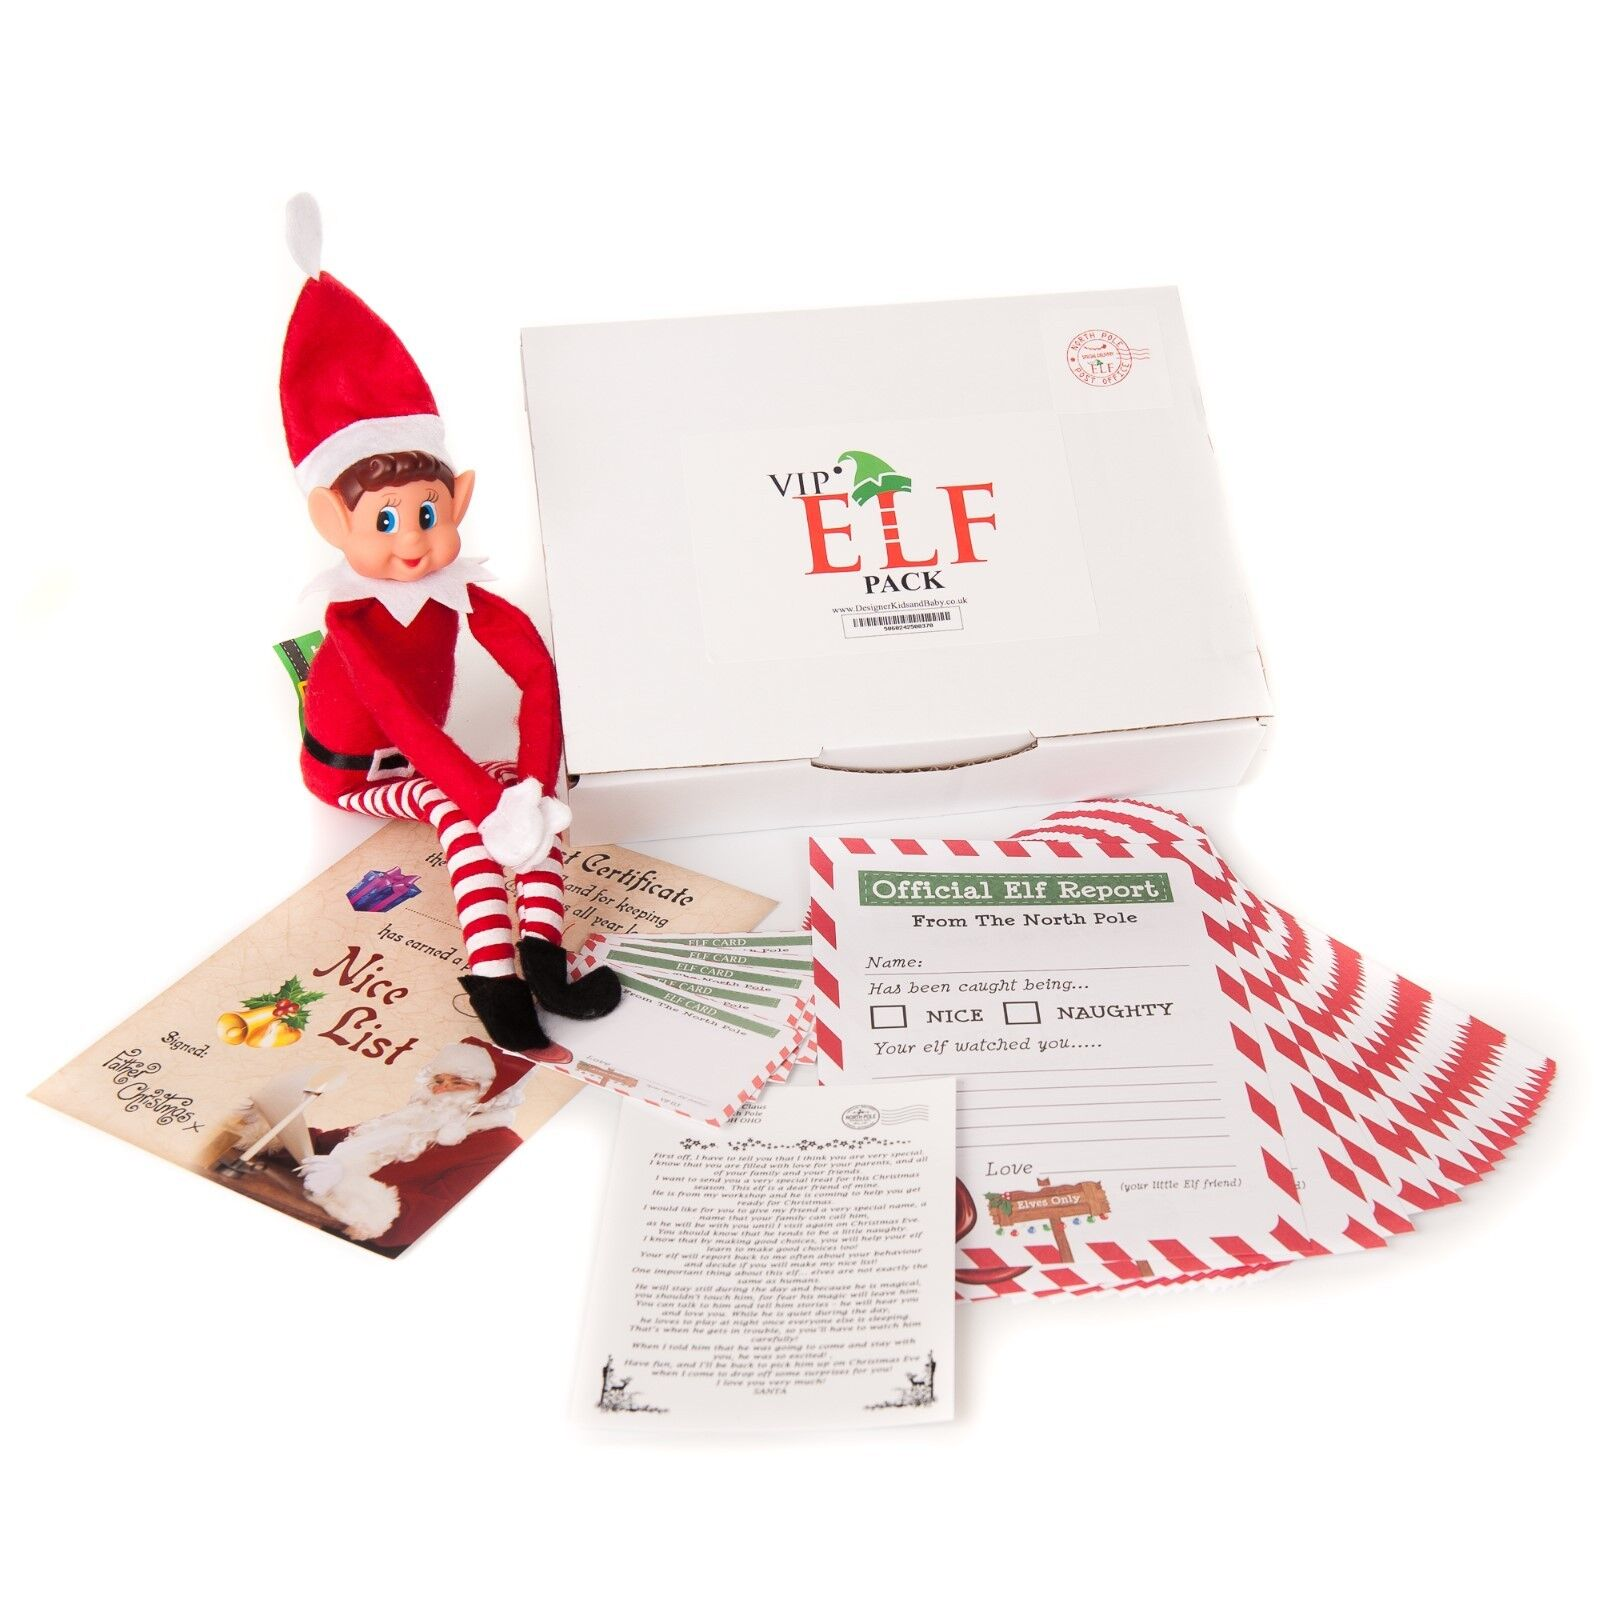 Vip Elf Pacote Com Certificado De Lista De Nice 24 Letra De Relatorios Natal Menino Ebay